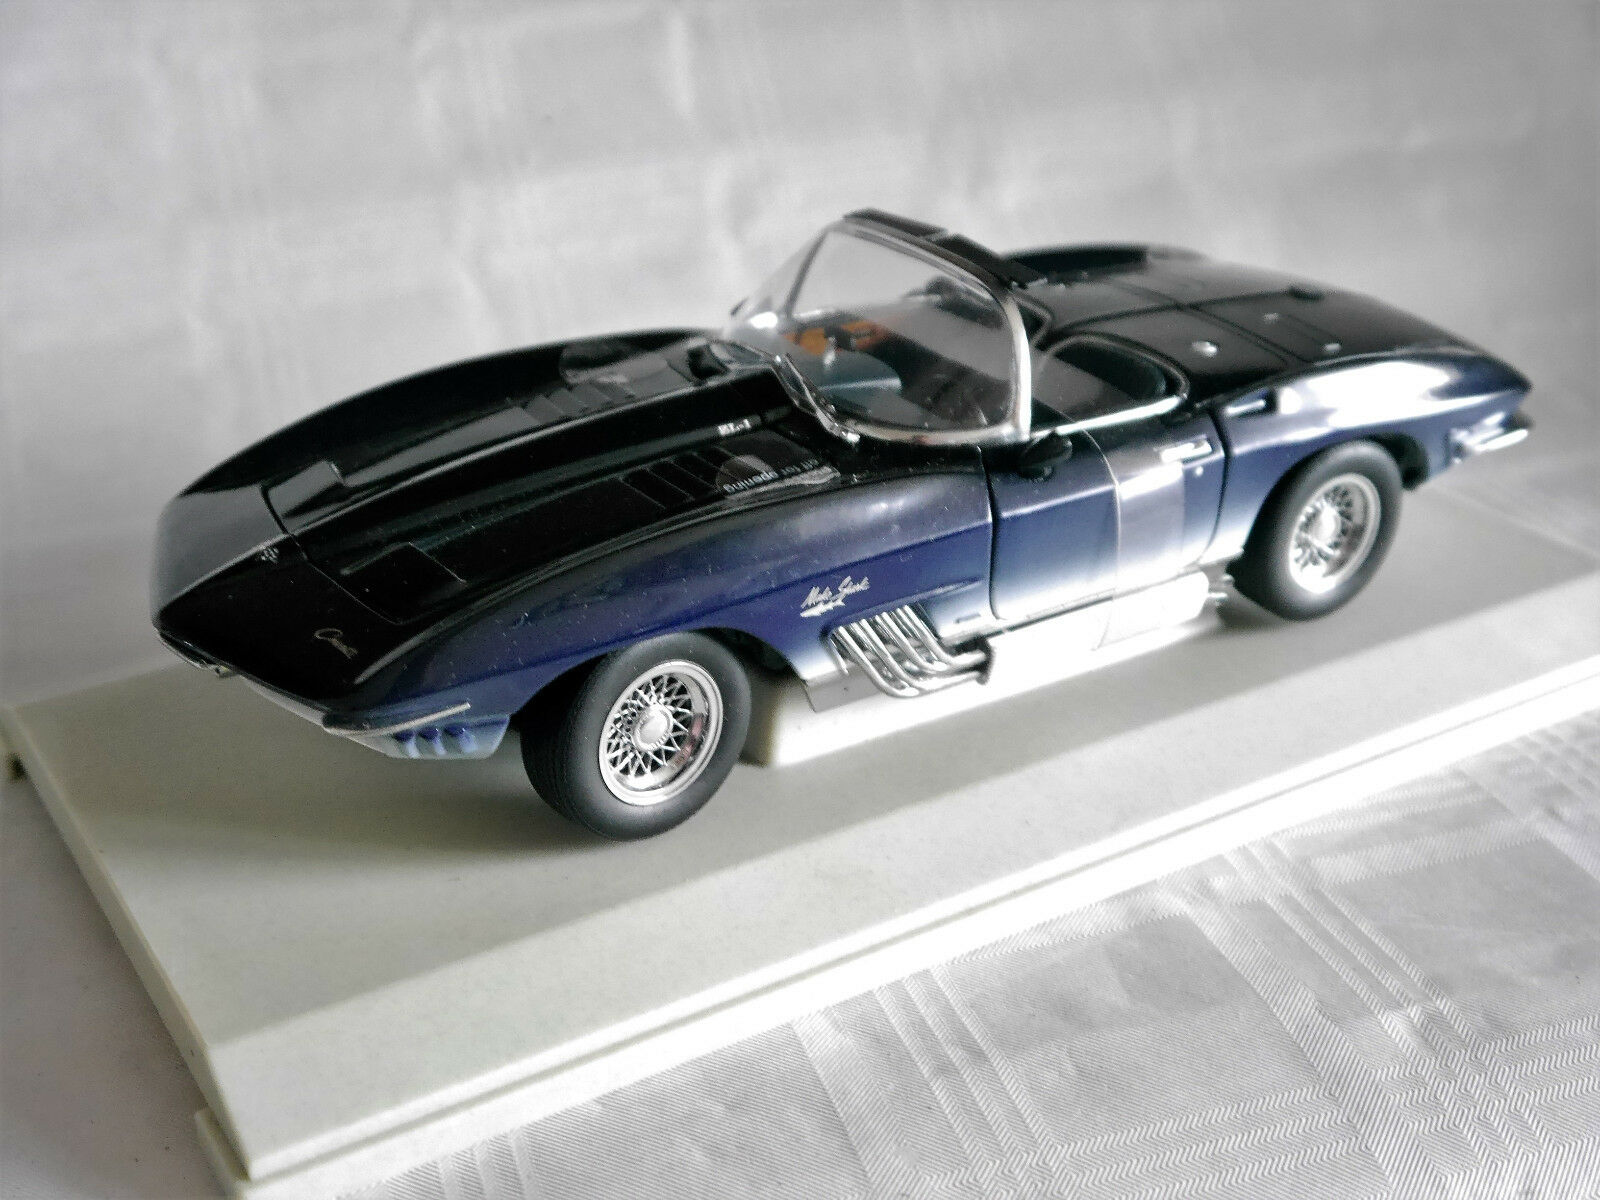 CHEVROLET Corvette Mako Shark Design prossootipo Prossootype, ut in 1 18 Boxed